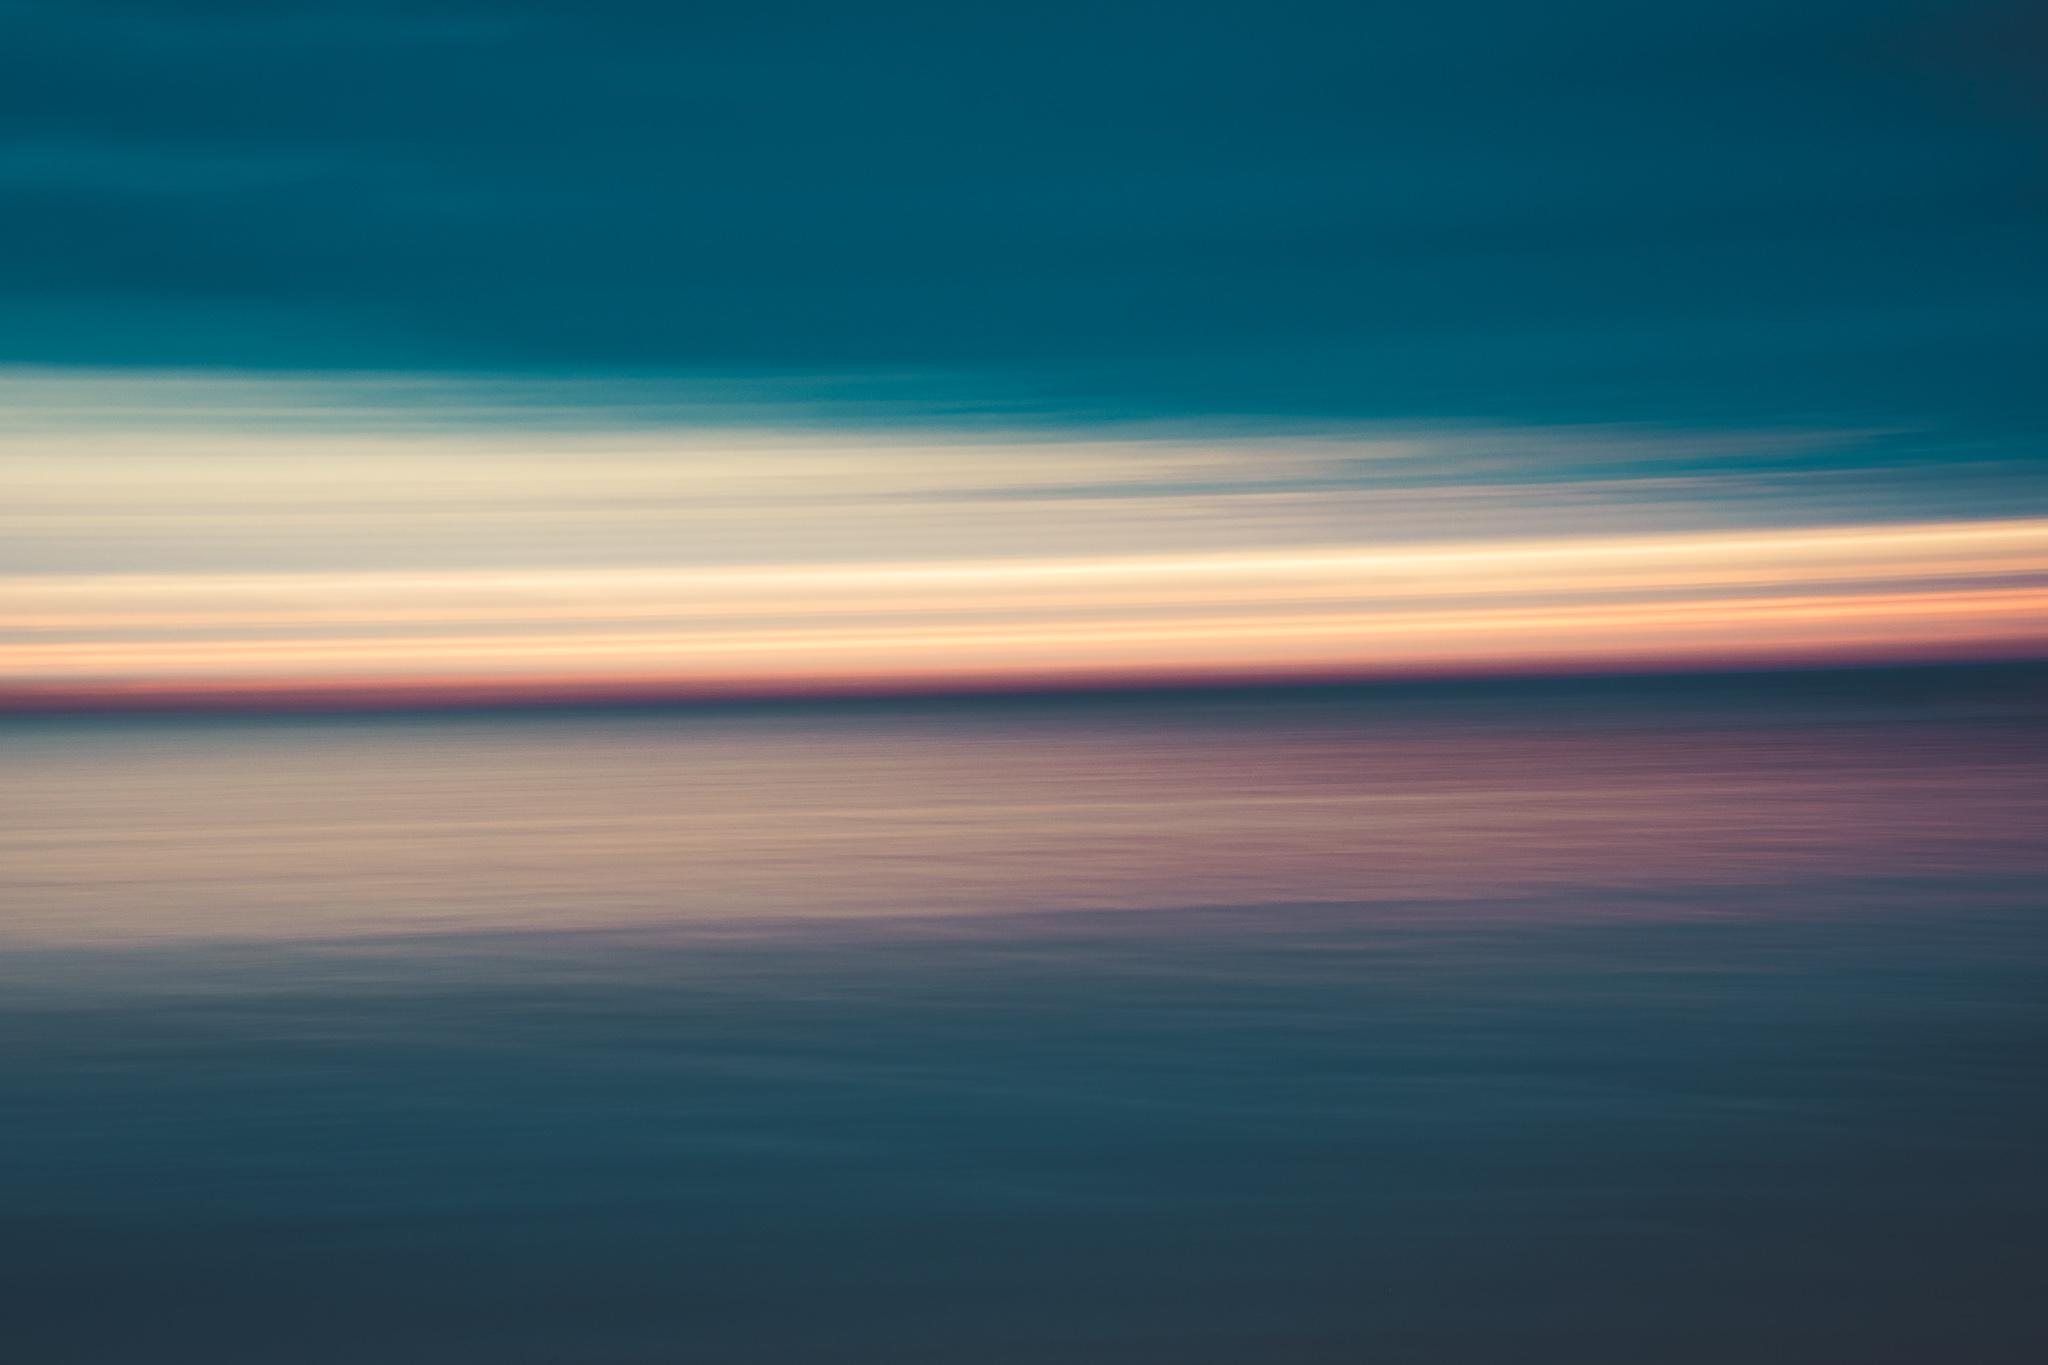 Motion Blur Effect - Sunrise at Paliton Beach